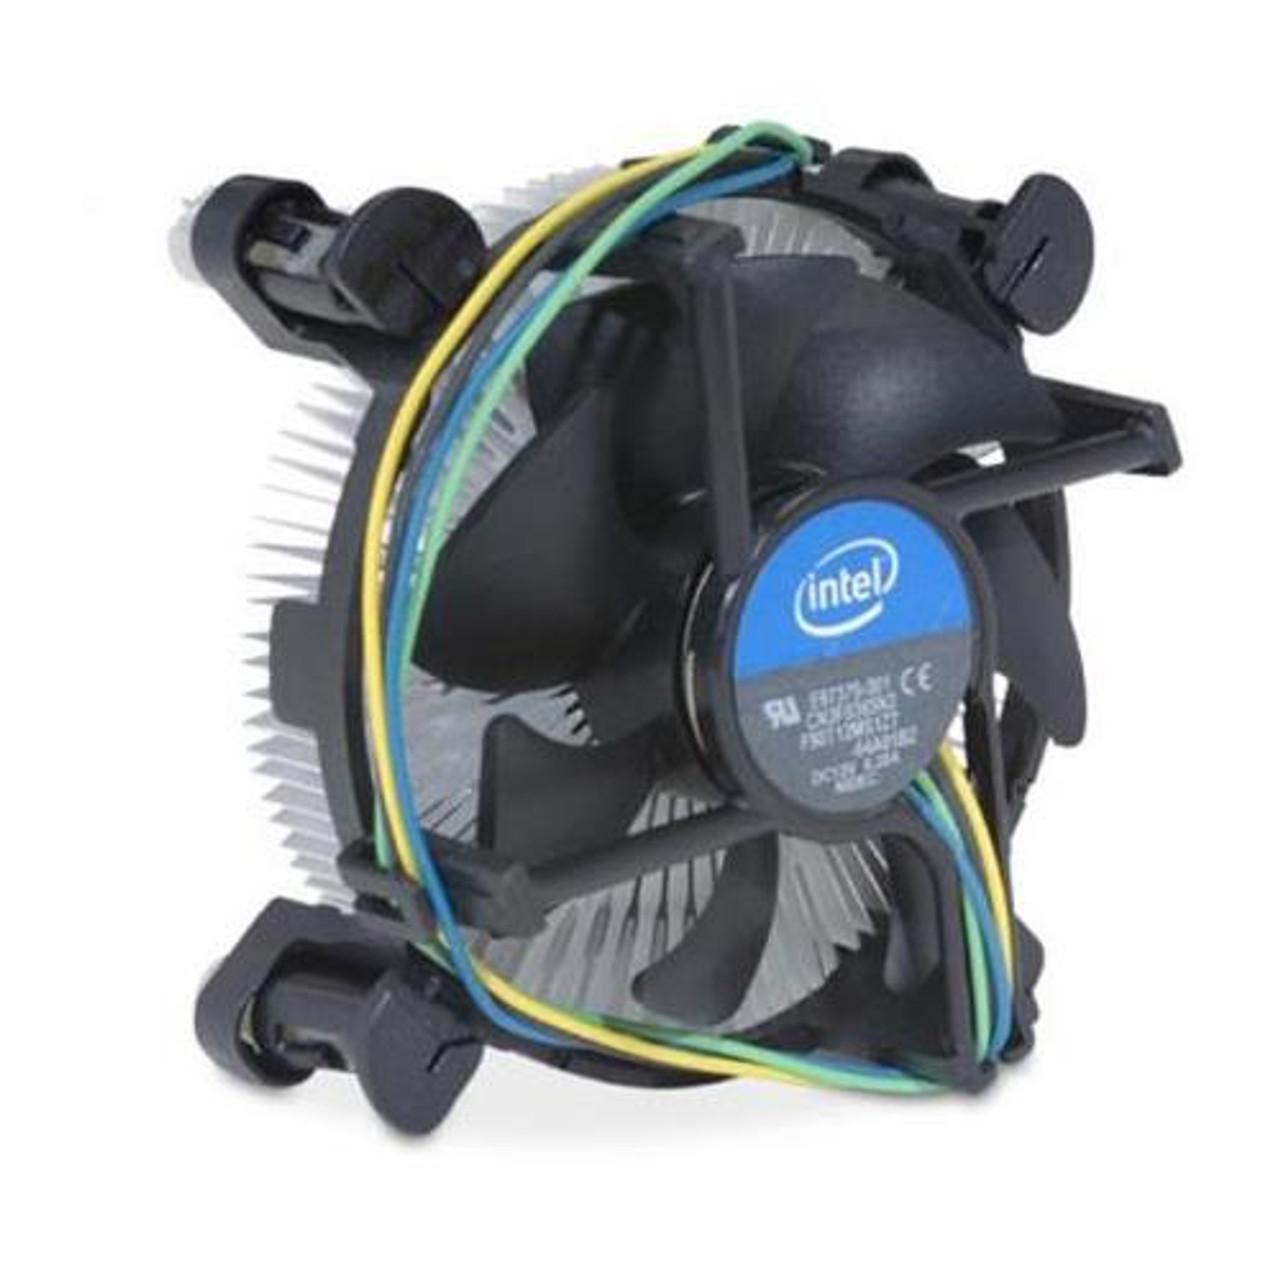 New Aluminum Heatsink and Fan for Intel E41997-002 Socket 1155 1156 US